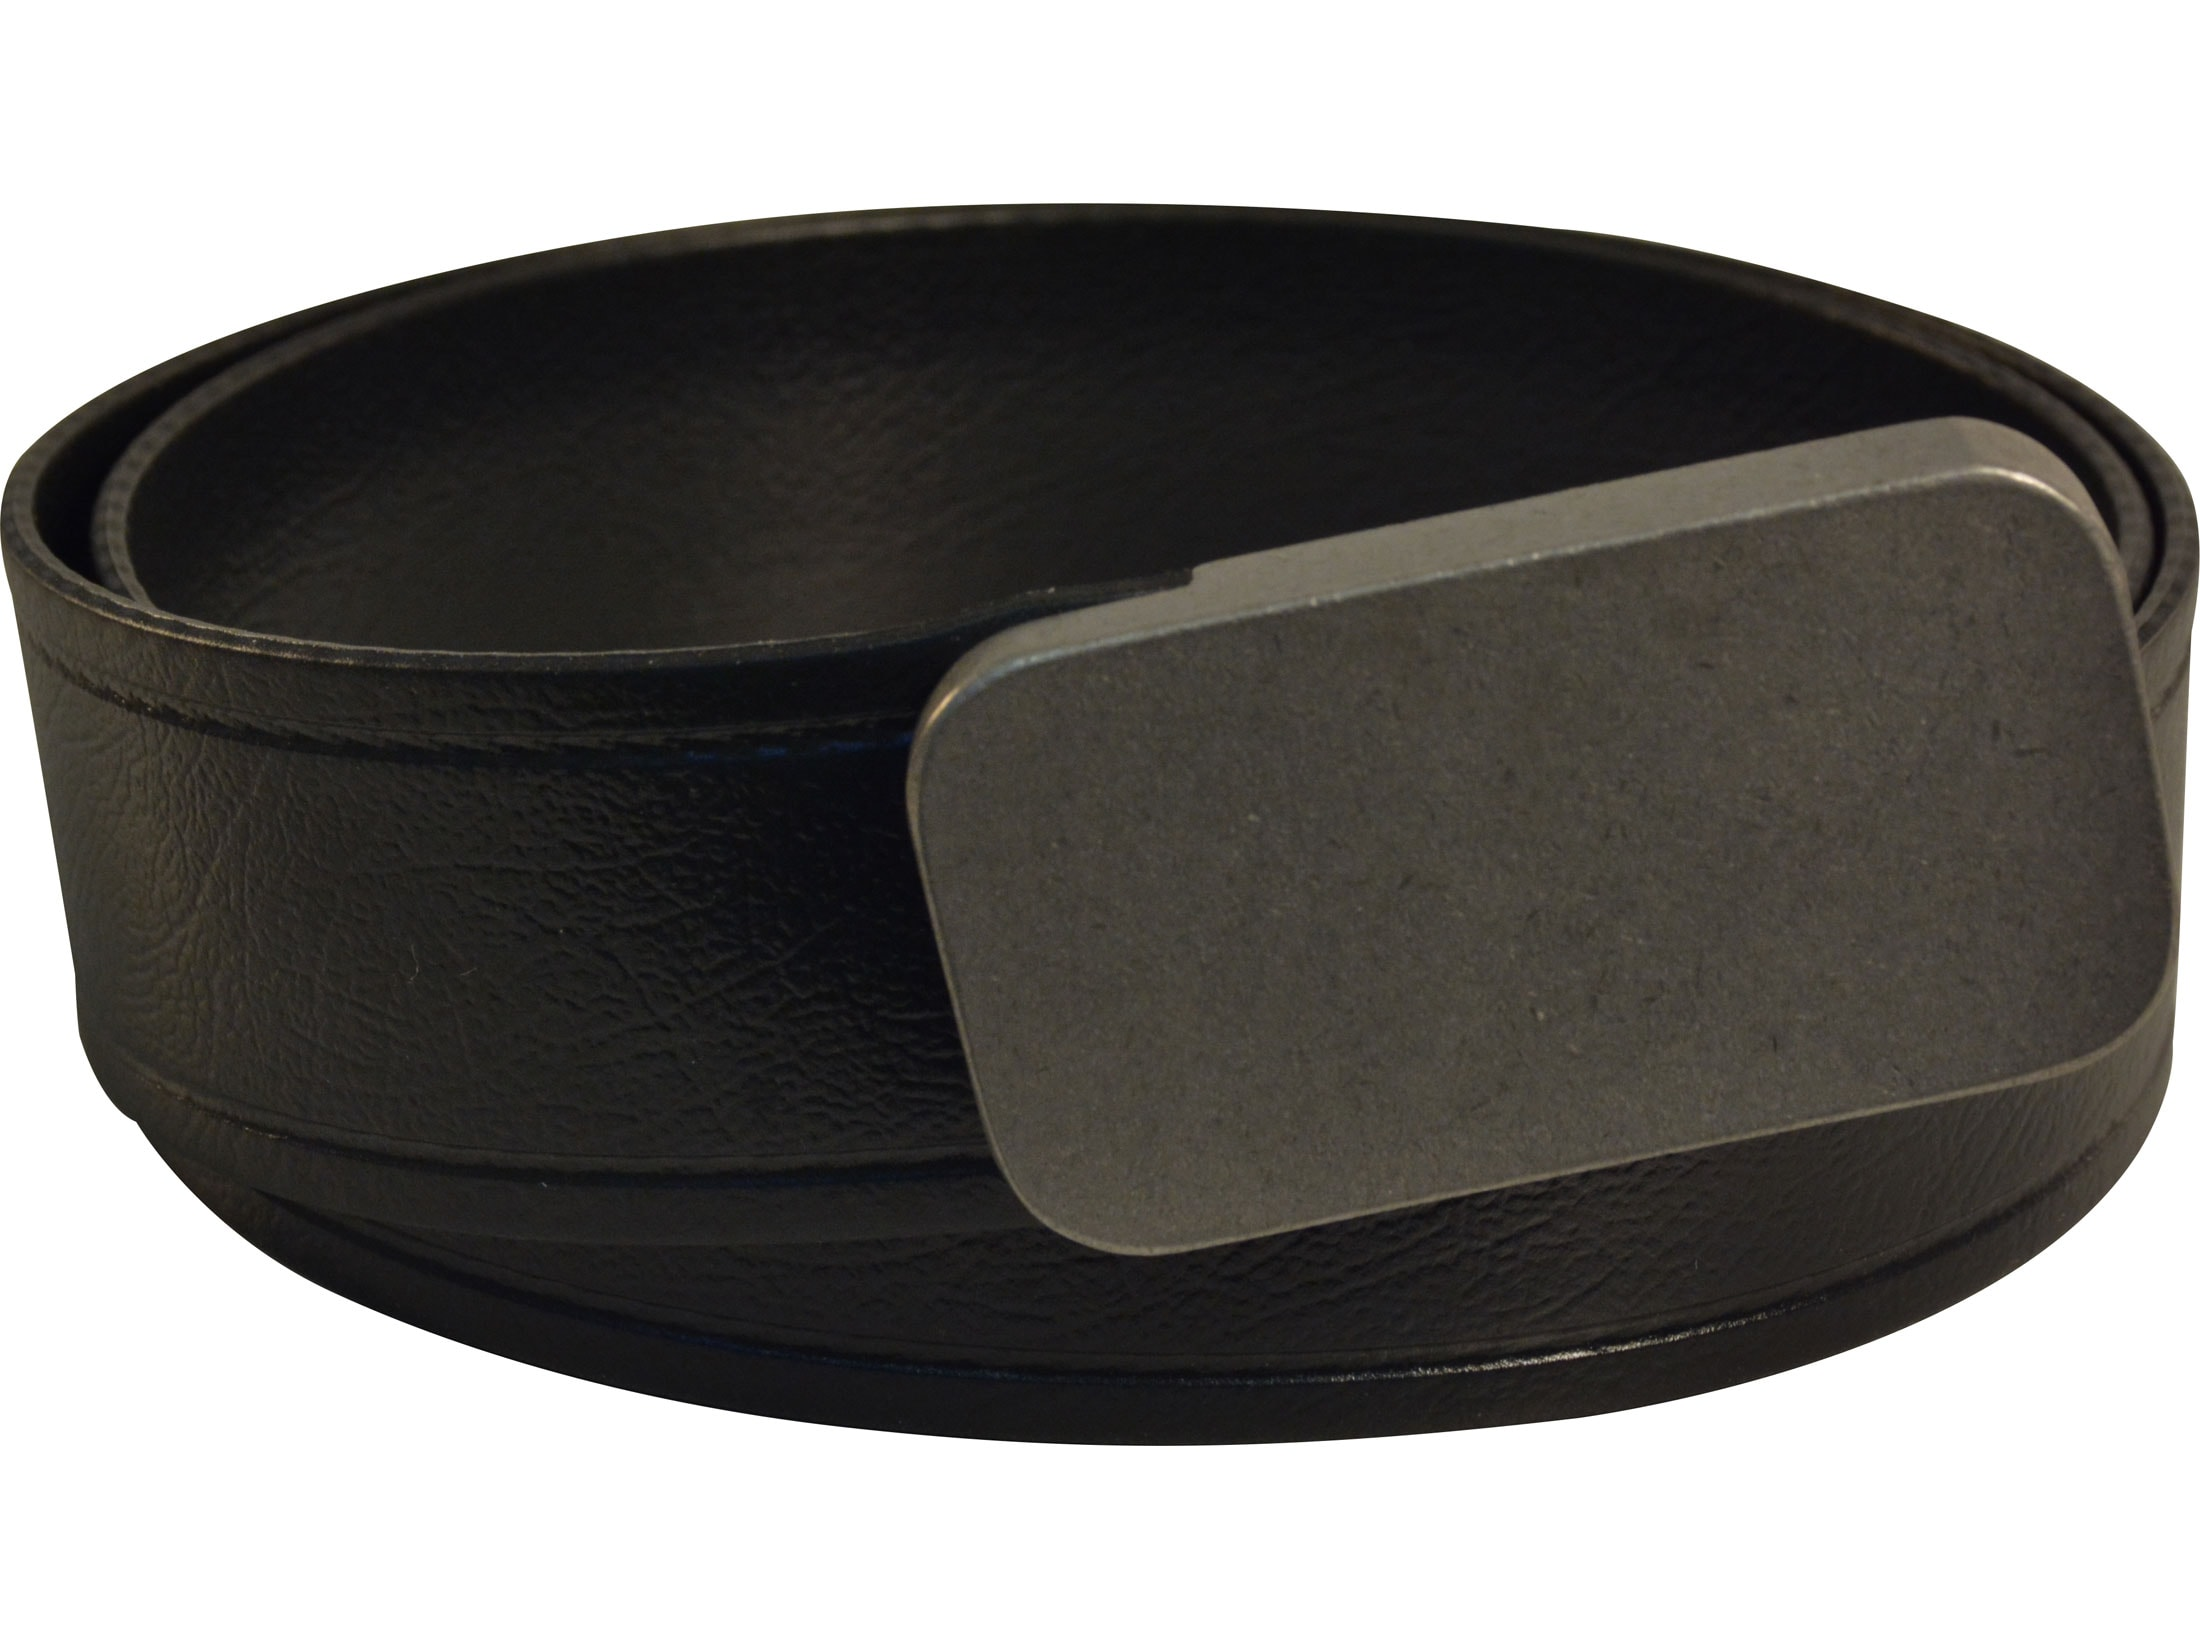 Lenwood Leather Blunt Force Trauma Hybrid Belt 1.5 Stainless Steel Buckle.